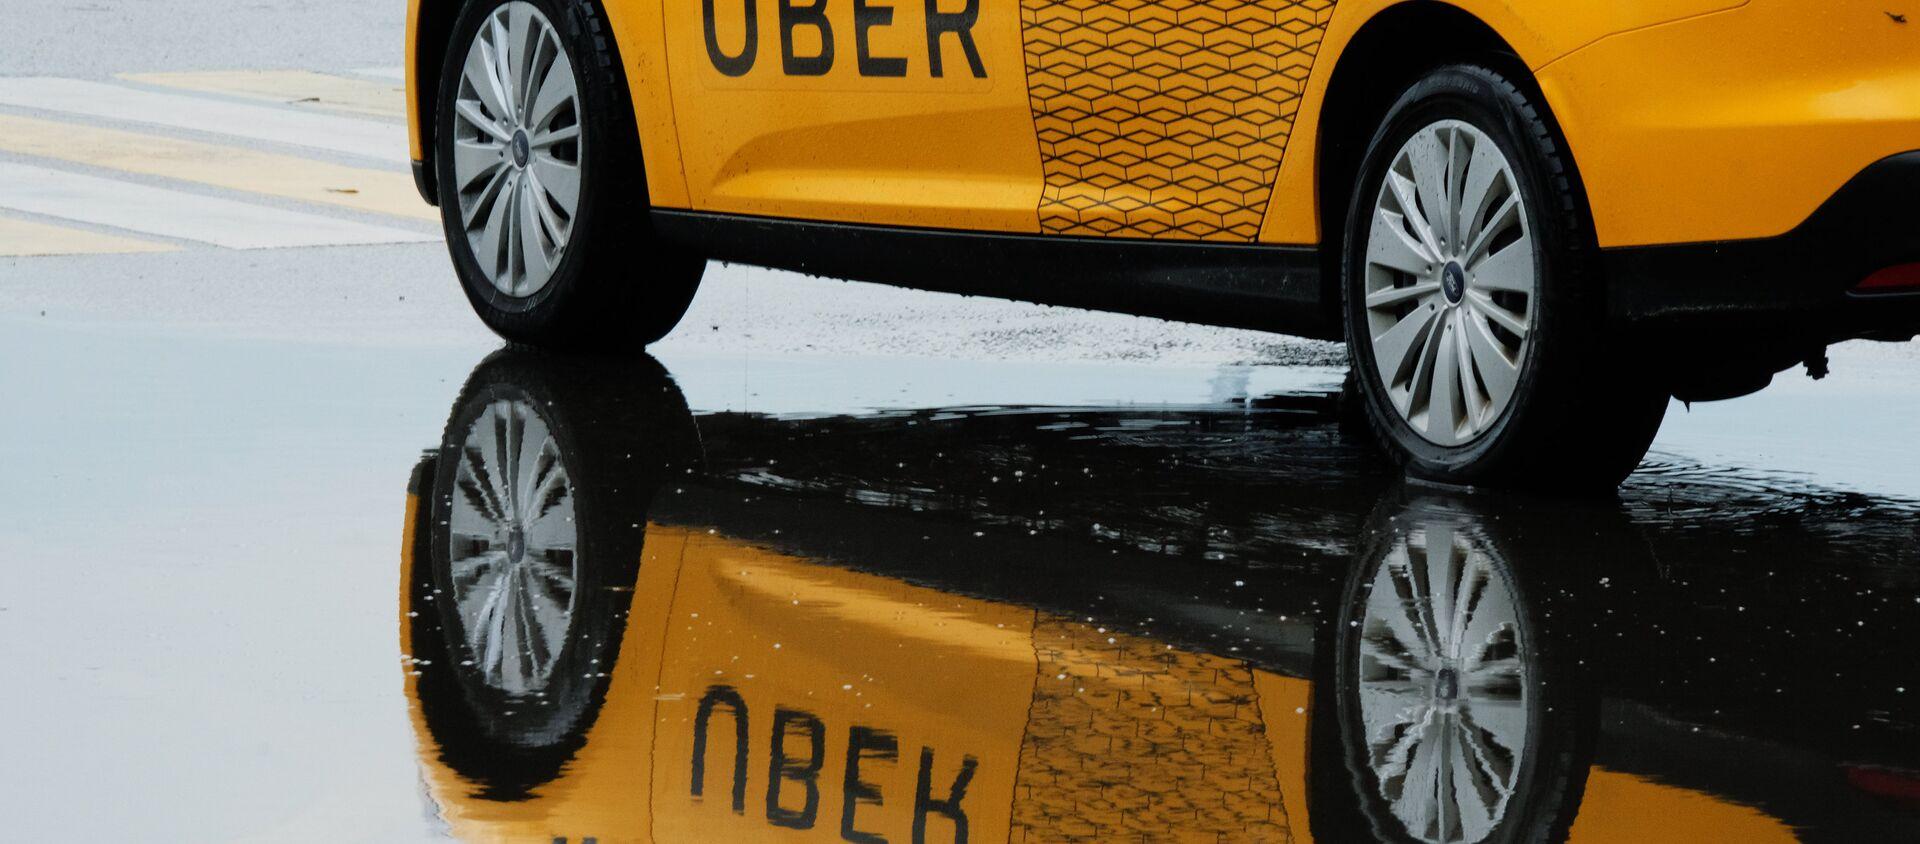 Uber - Sputnik Polska, 1920, 01.10.2020